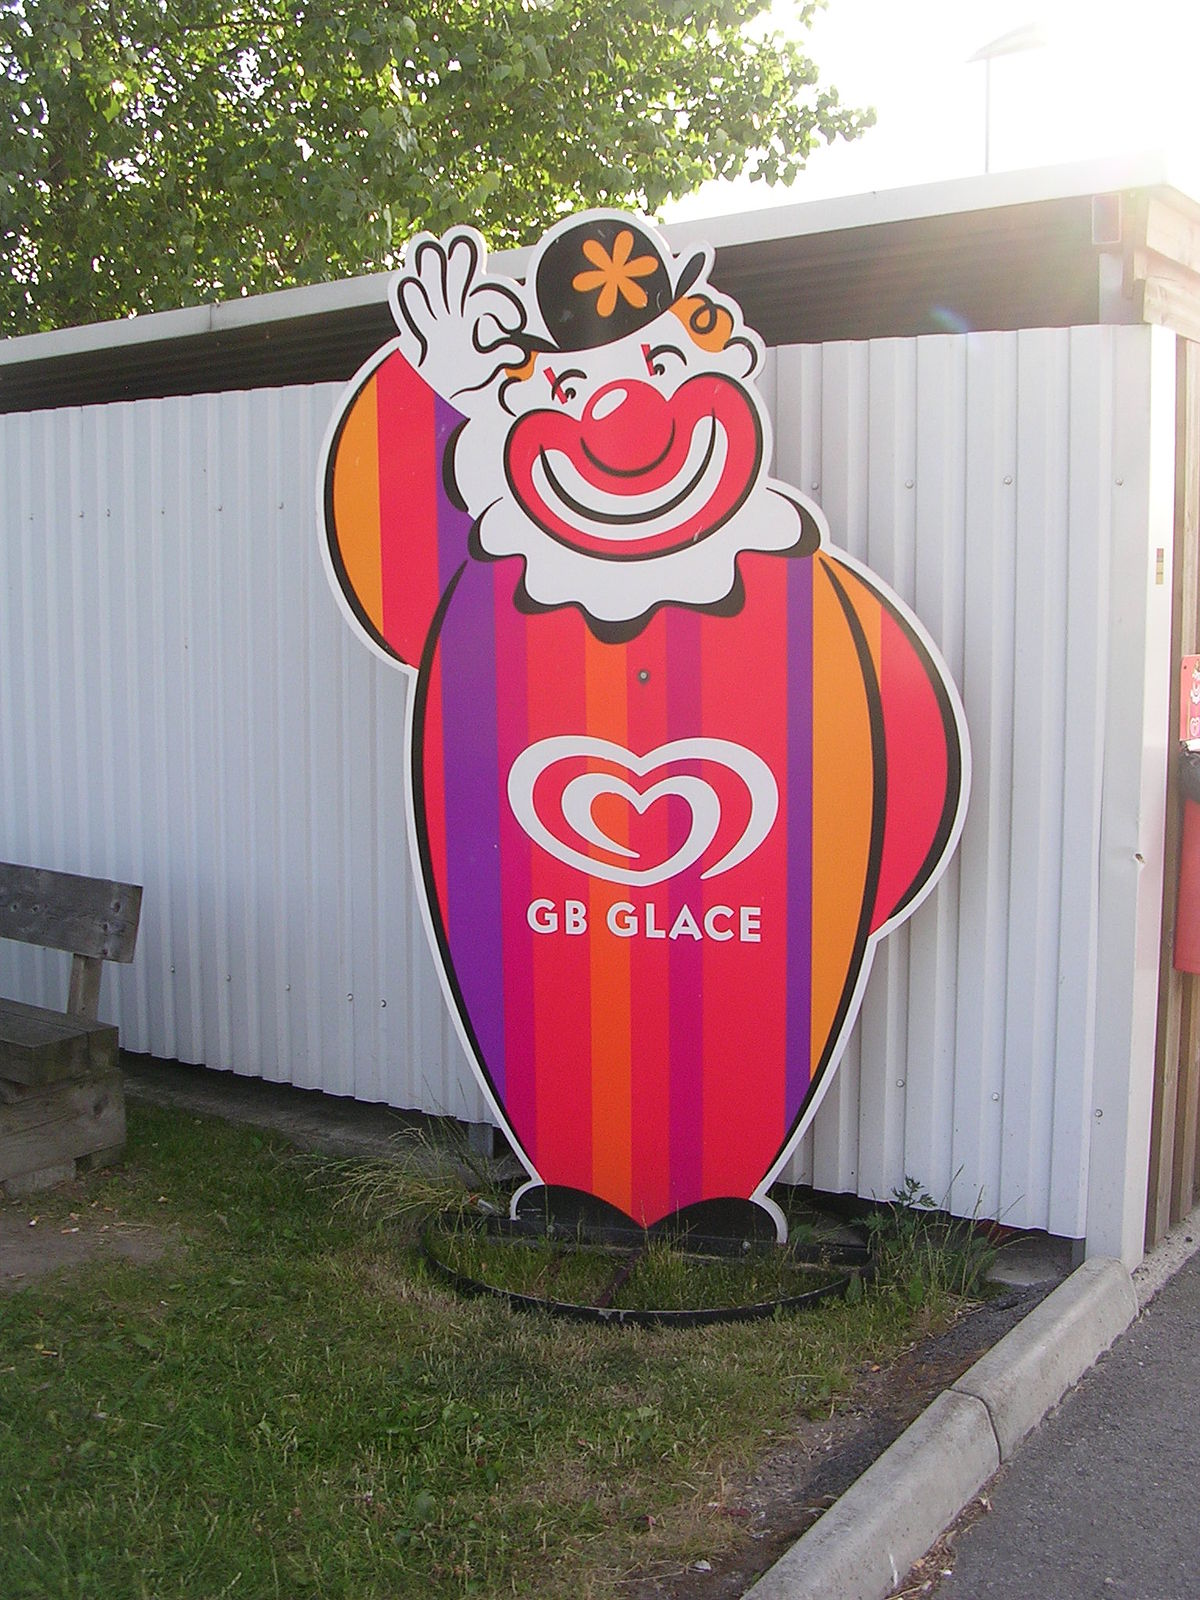 GB Glace - Wikipedia